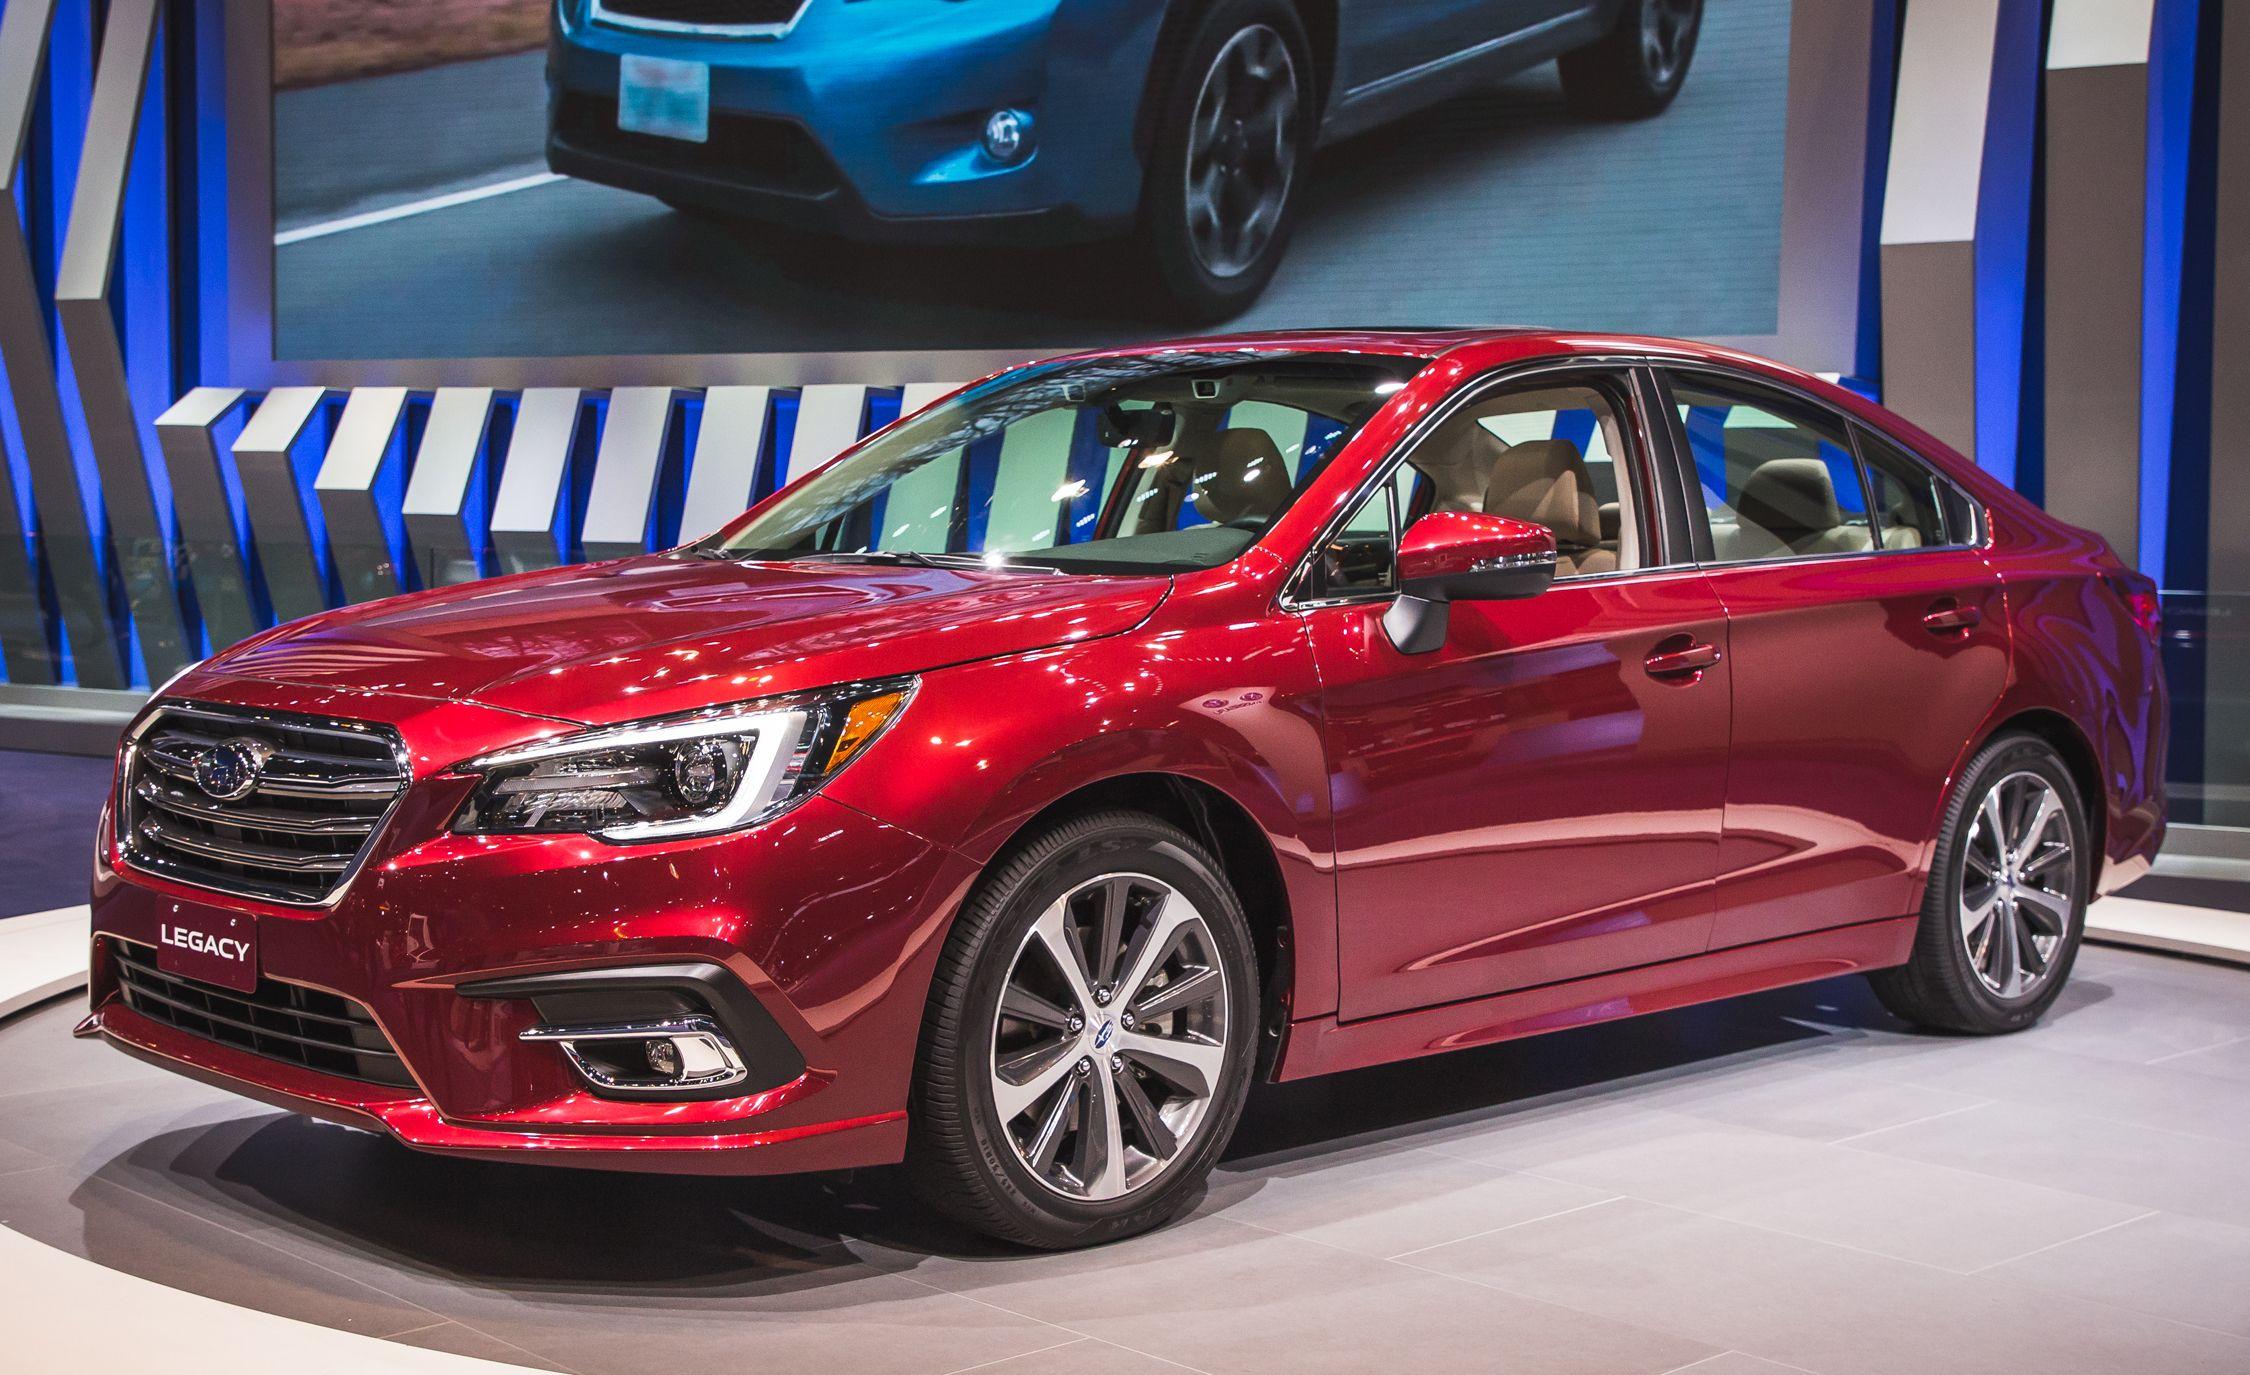 2018 Subaru Legacy Sedan Debuts With Subtle Updates